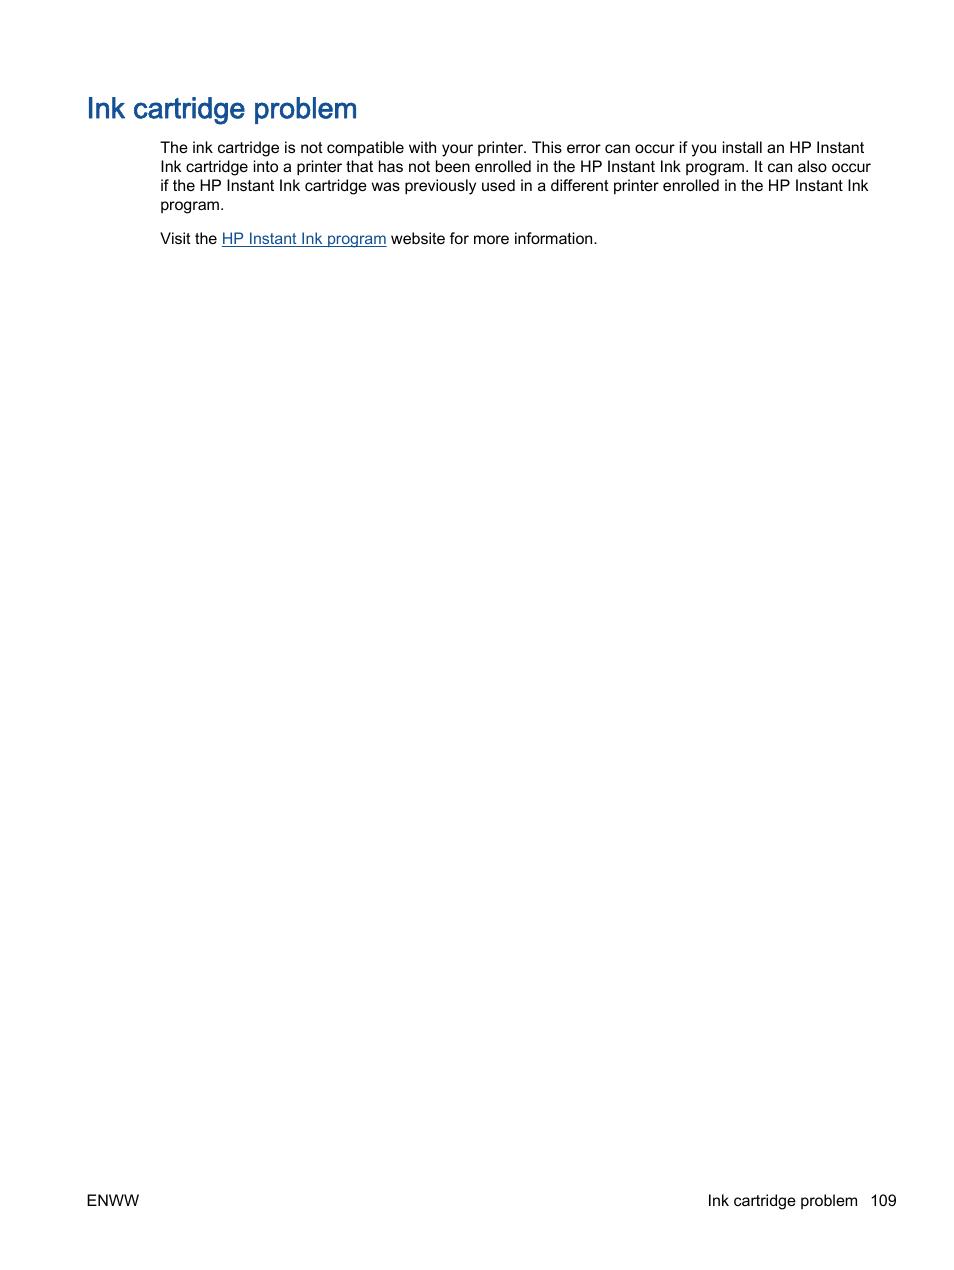 Ink cartridge problem | HP Officejet 4630 e-All-in-One